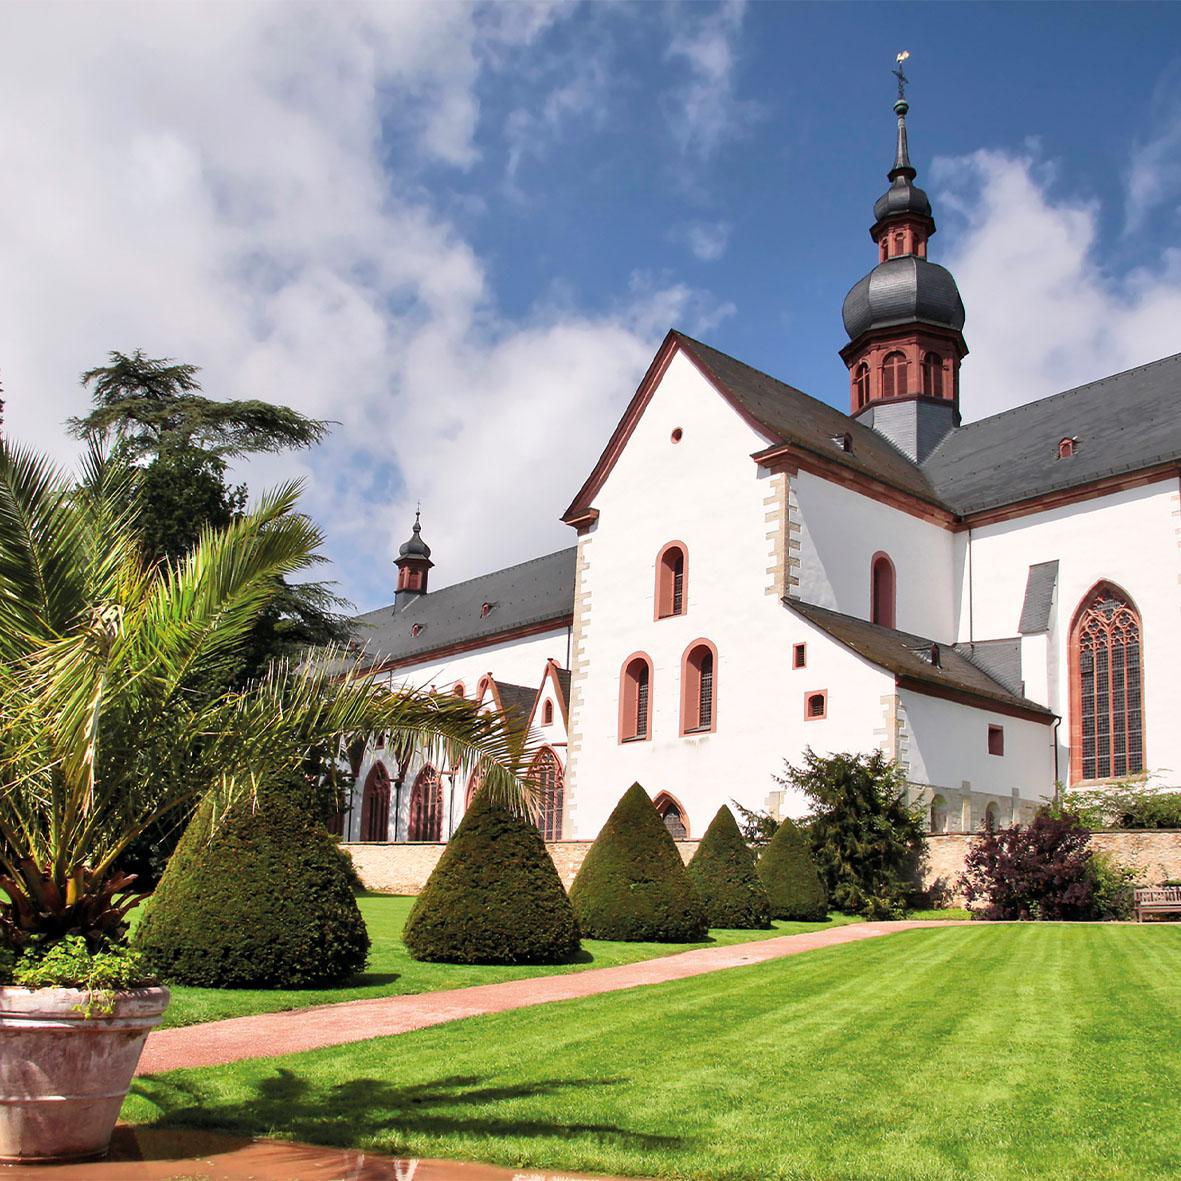 Aldersbach monastery